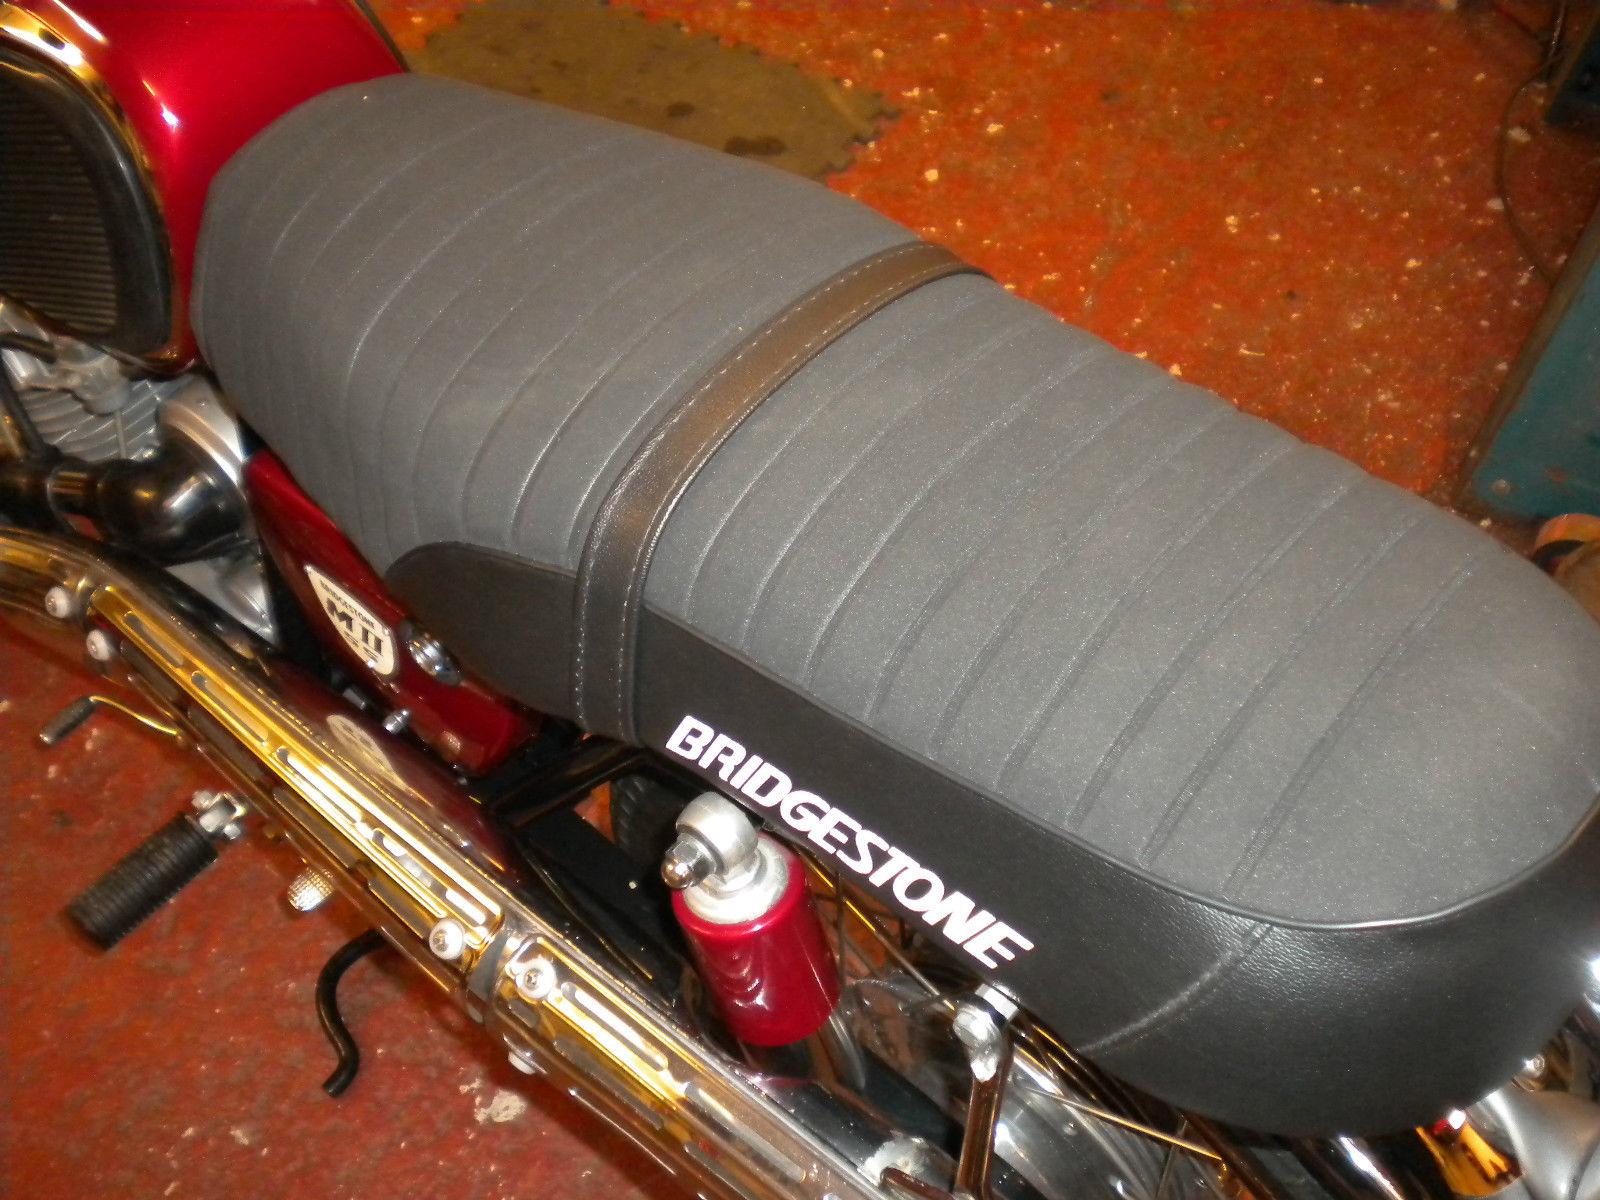 Bridgestone Mach11 -1969 - Seat, Shock Absorber Top Mounting.